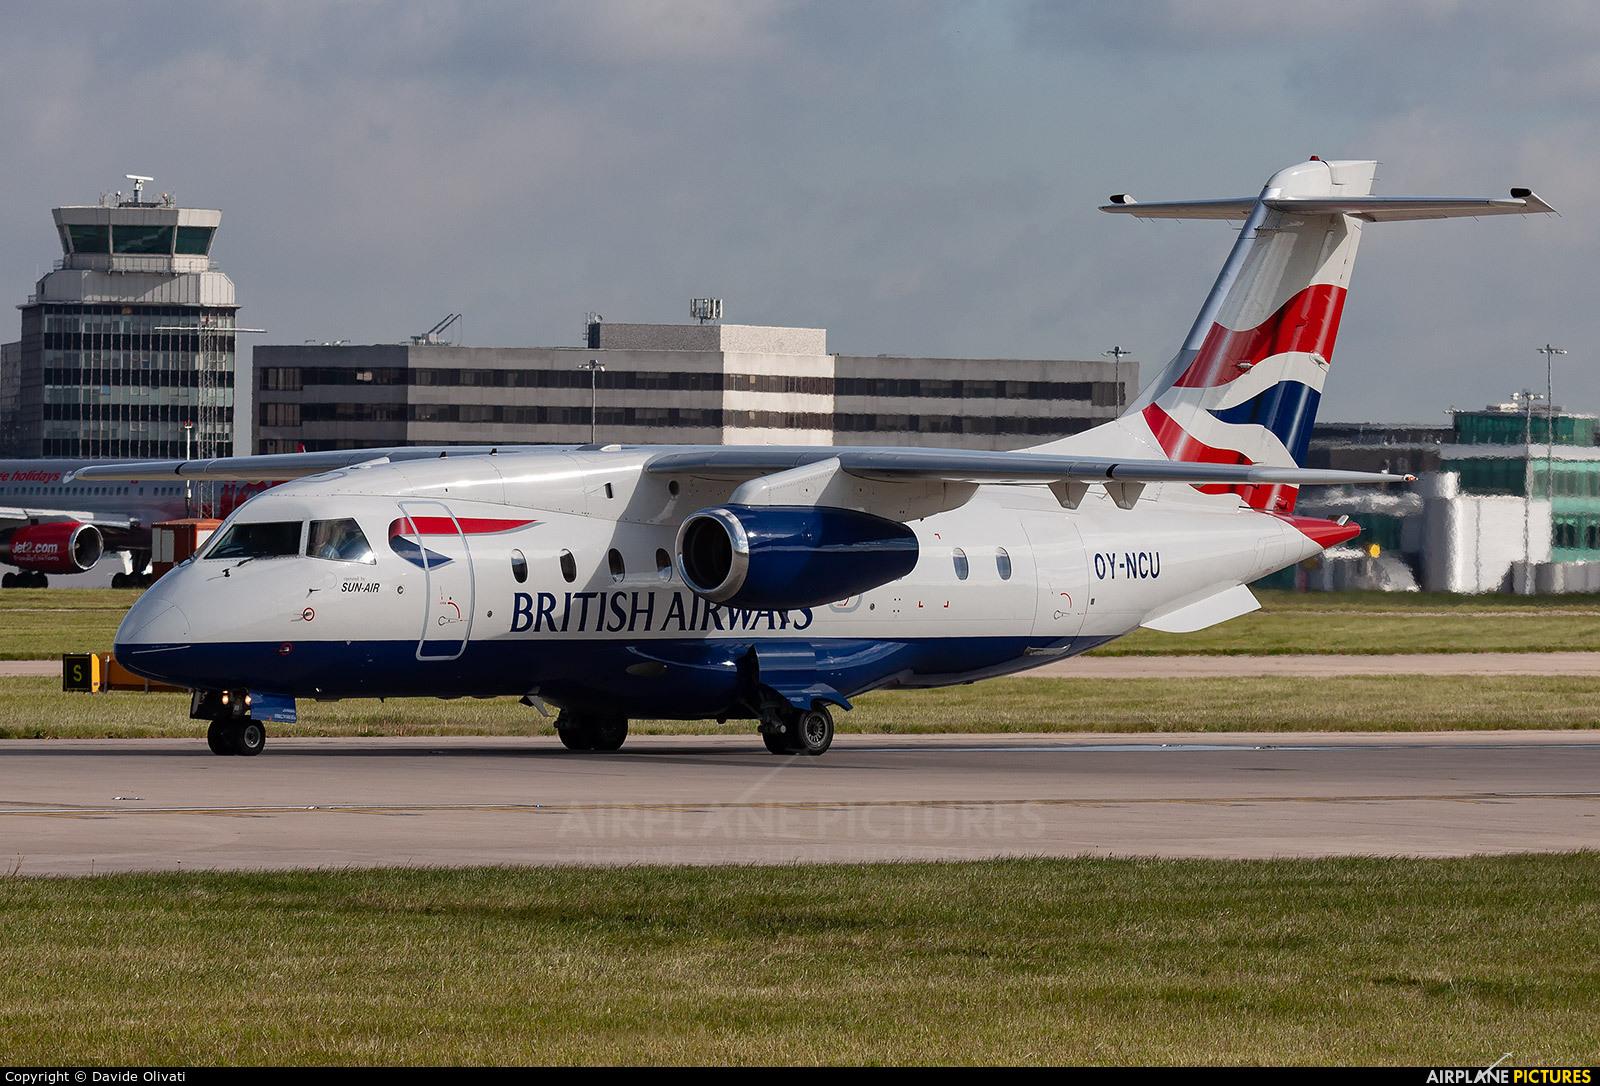 British Airways - Sun Air OY-NCU aircraft at Manchester